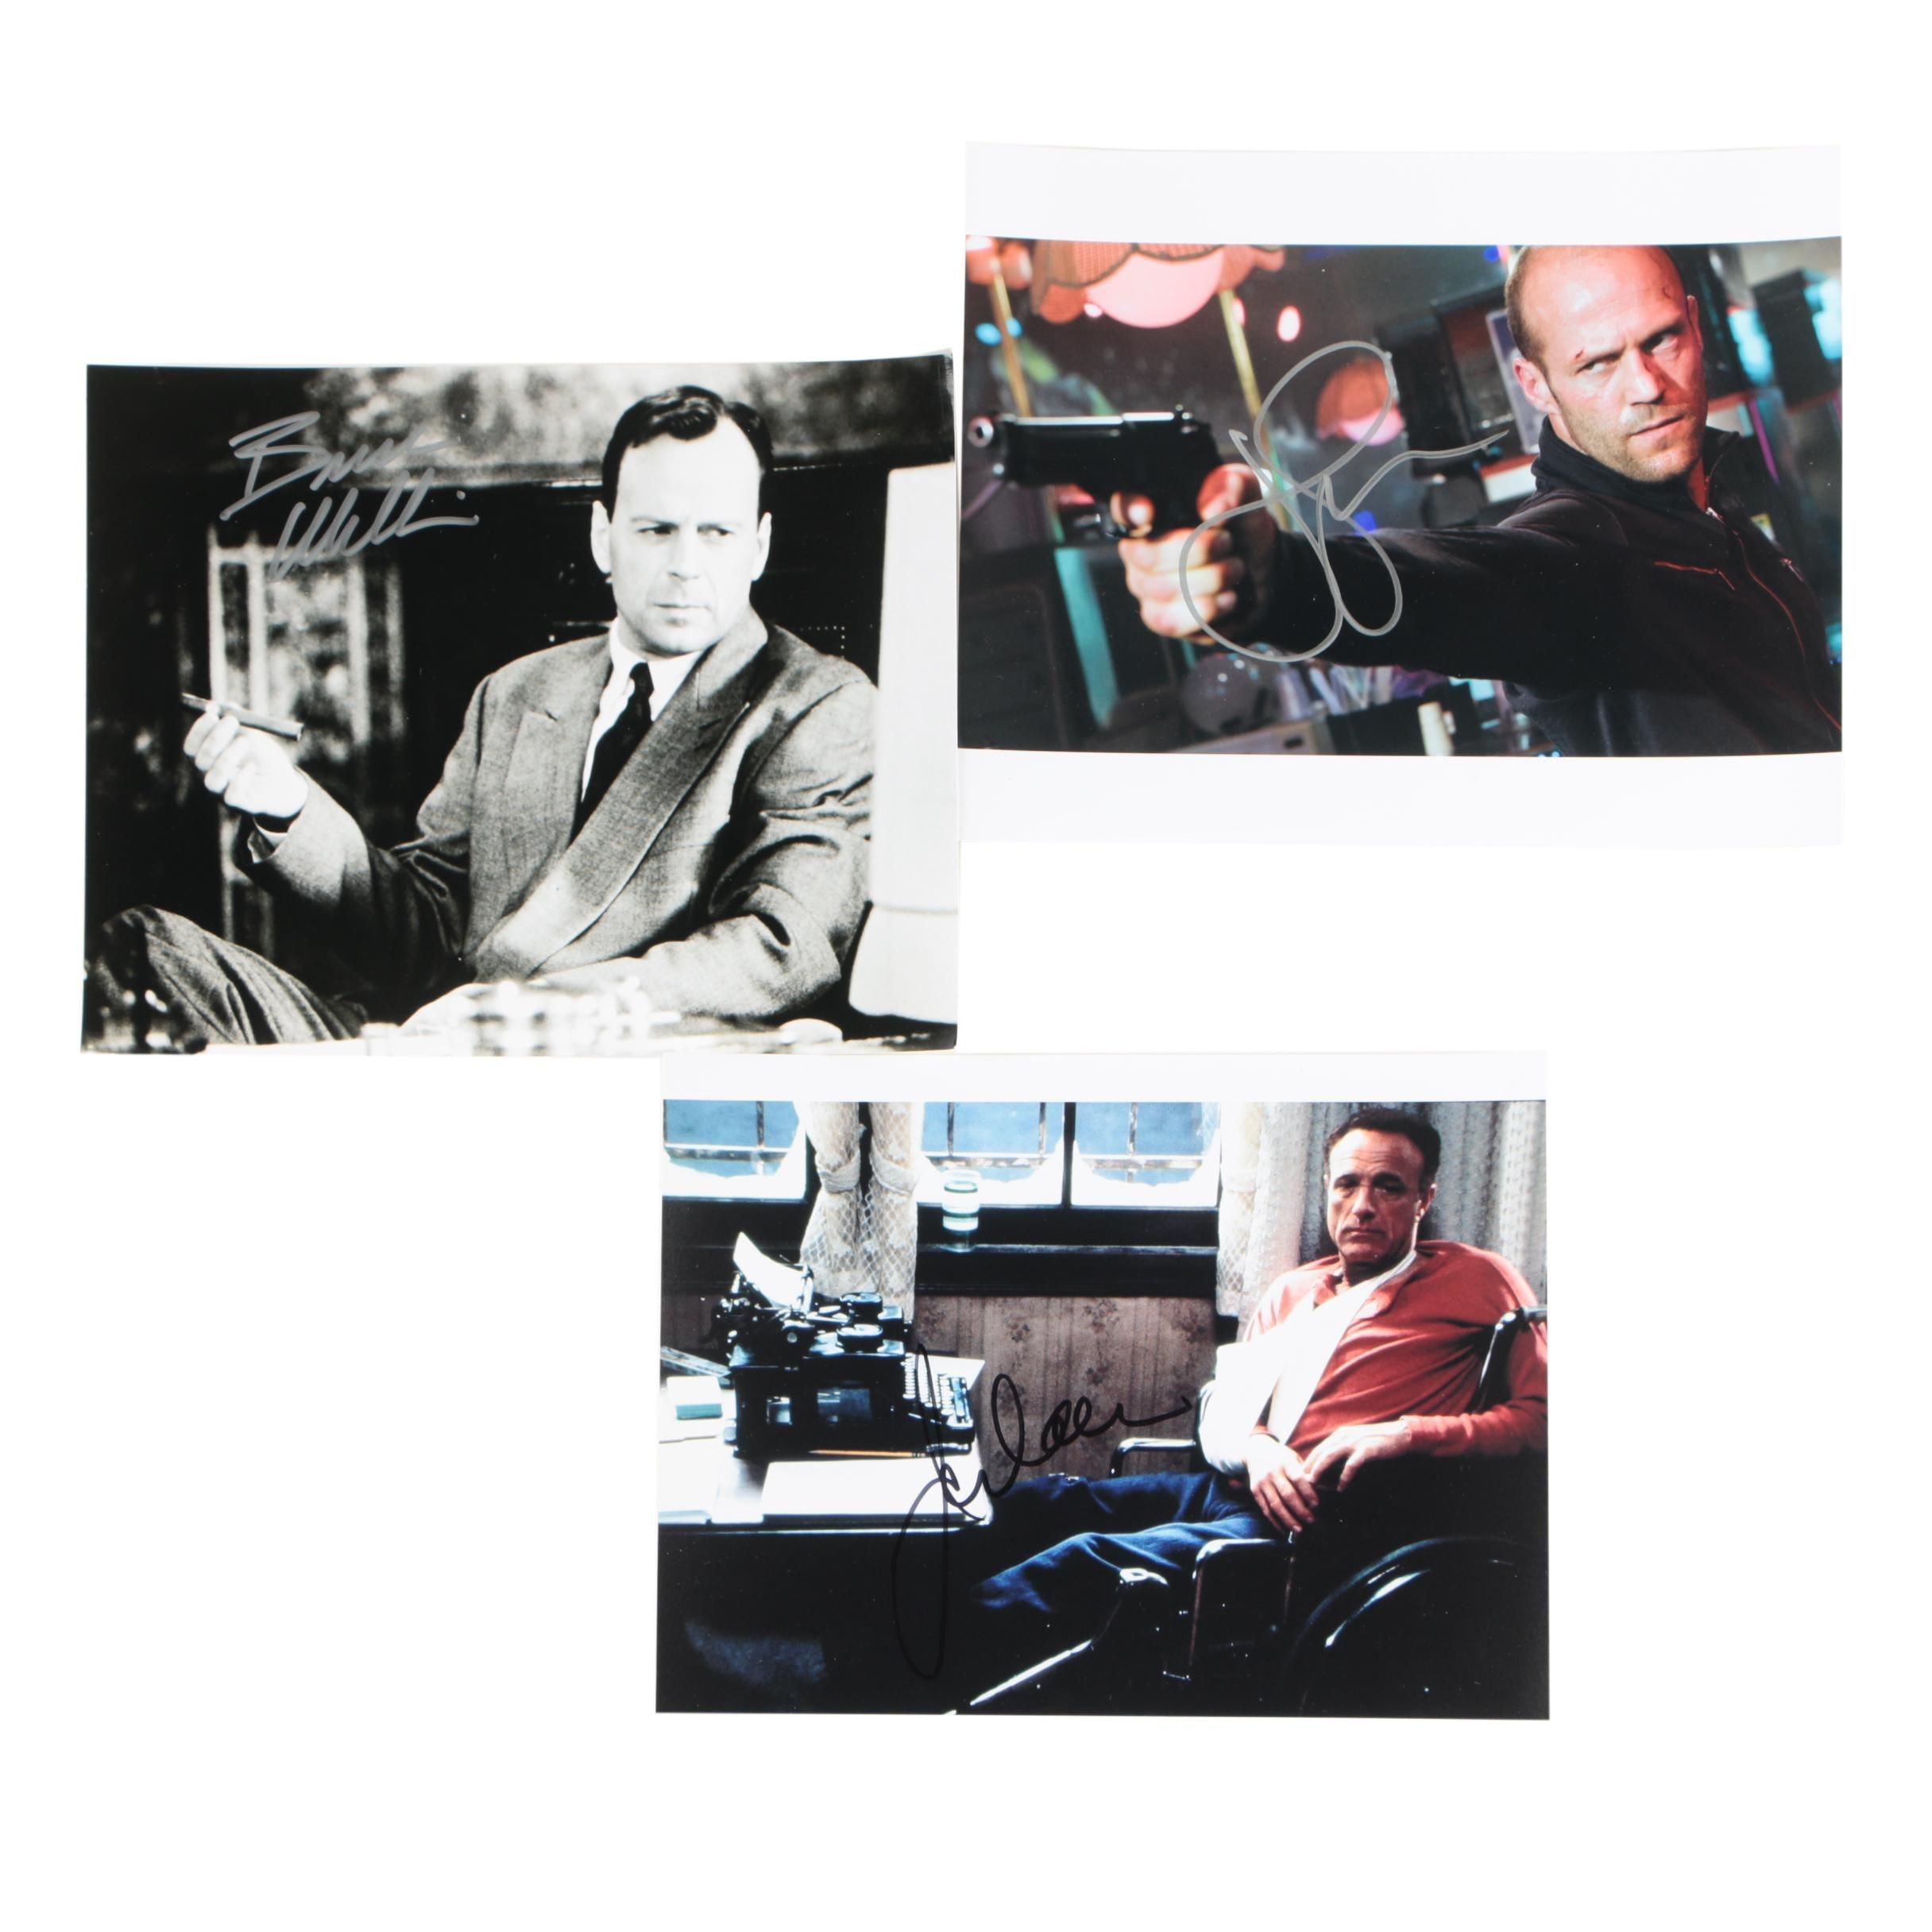 Bruce Willis, James Caan and Jason Statham Autographed Photos